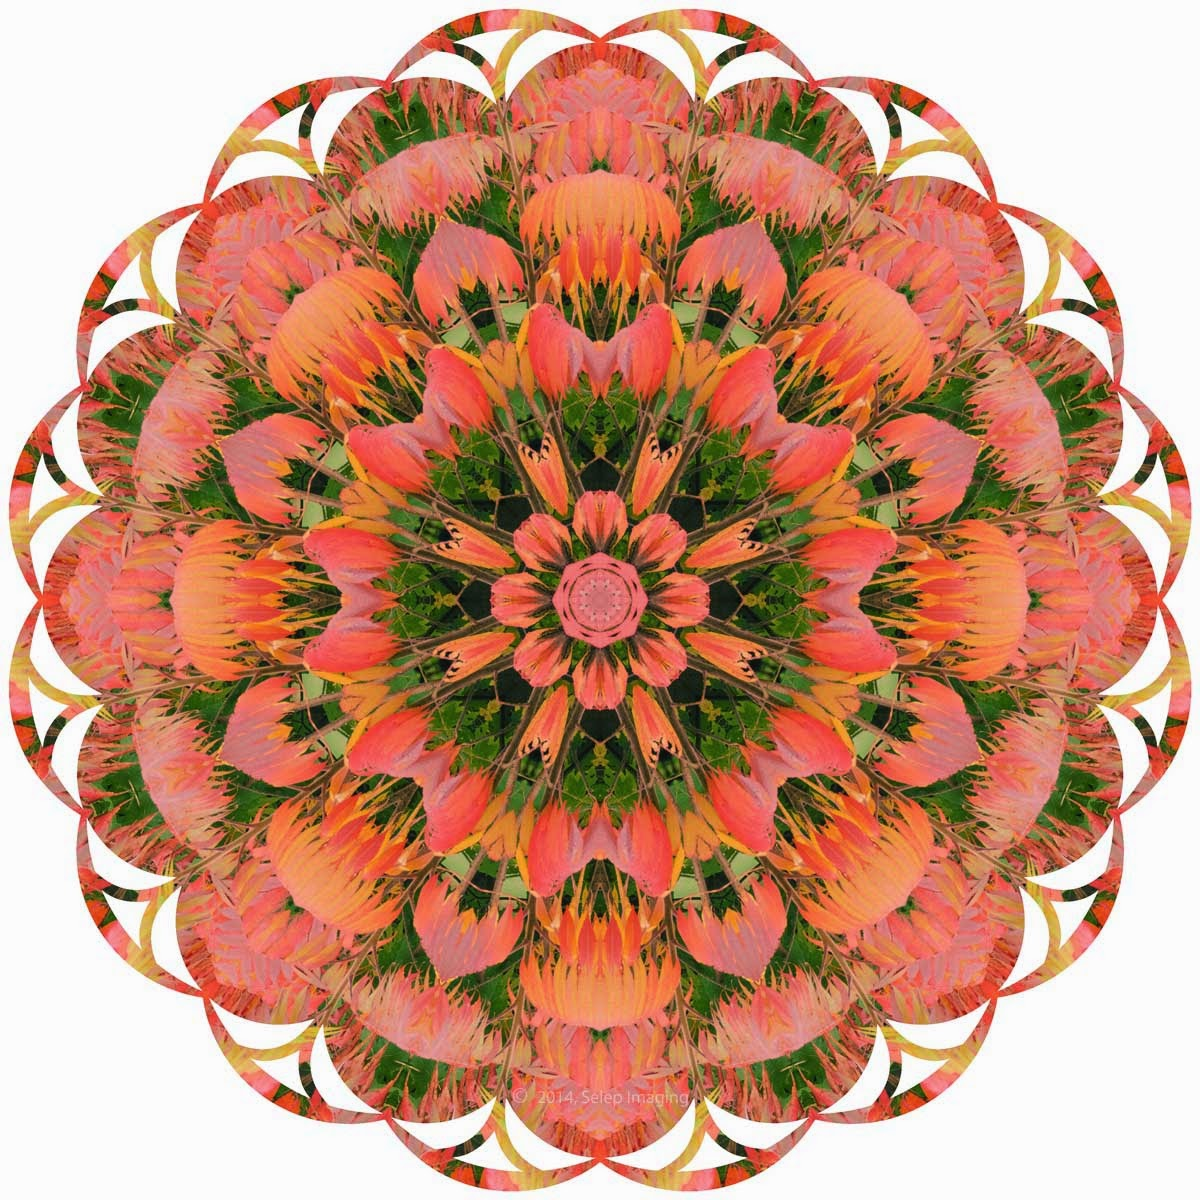 Kaleidoscope Photo Art sumac by Jeanne Selep